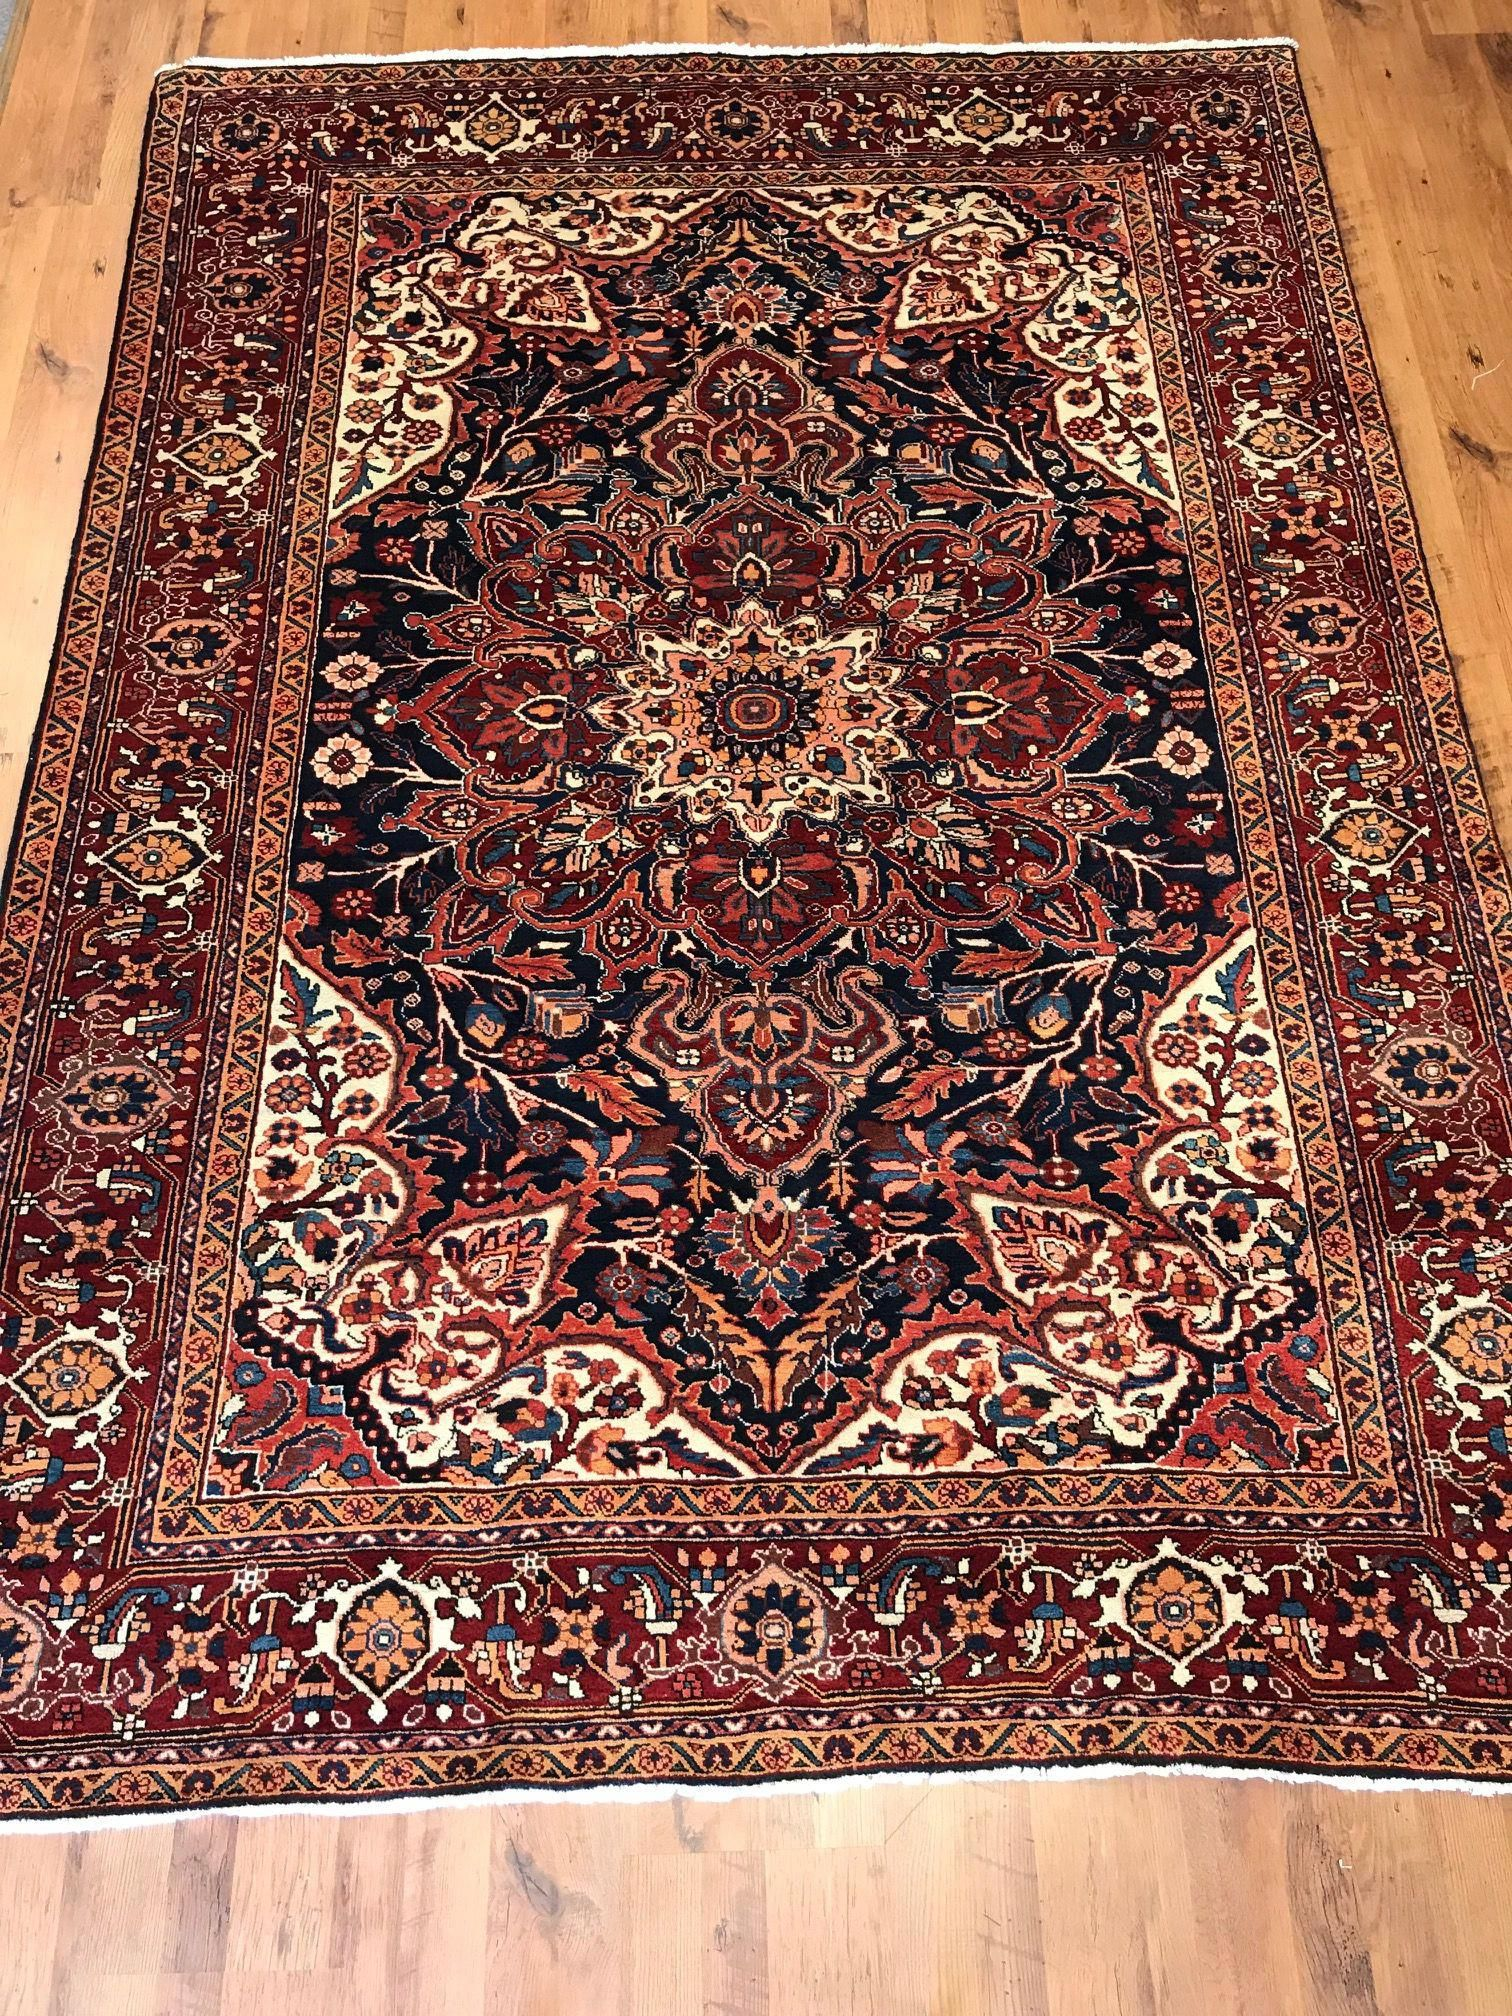 John Lewis Carpets Clearance